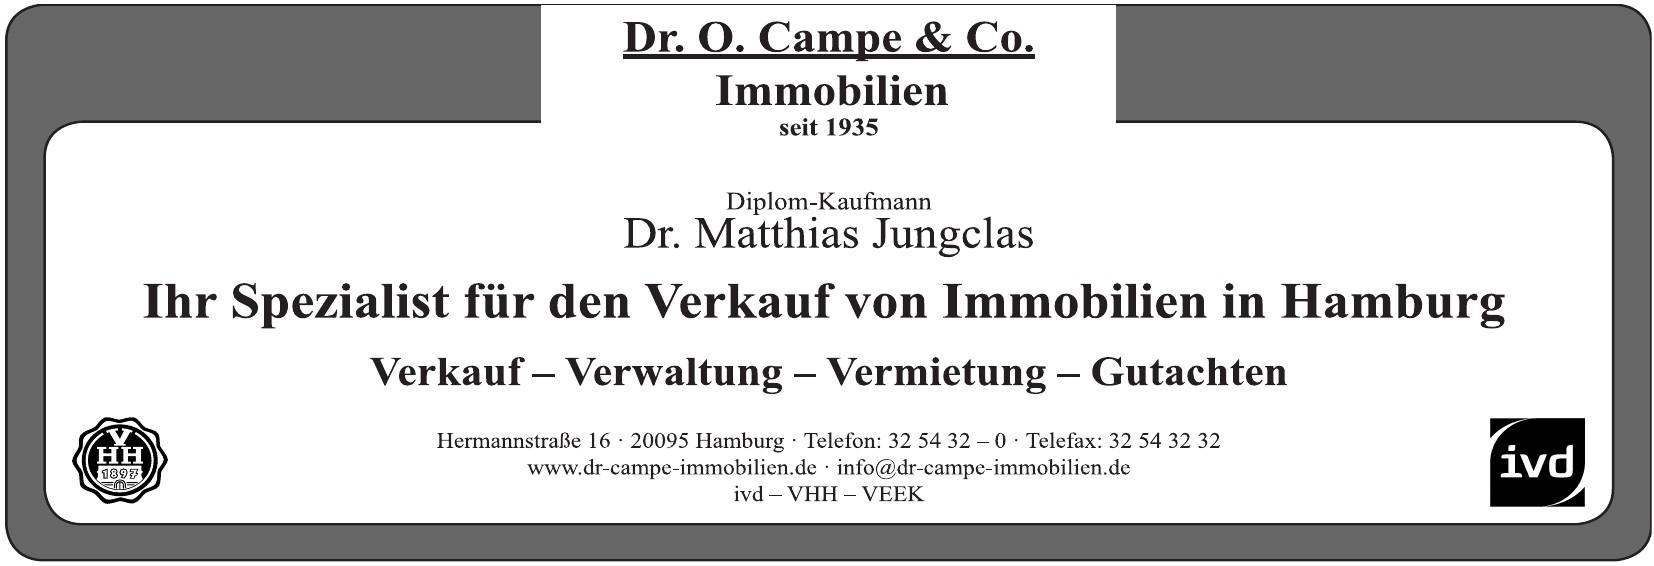 Dr. O. Campe & Co e.K.